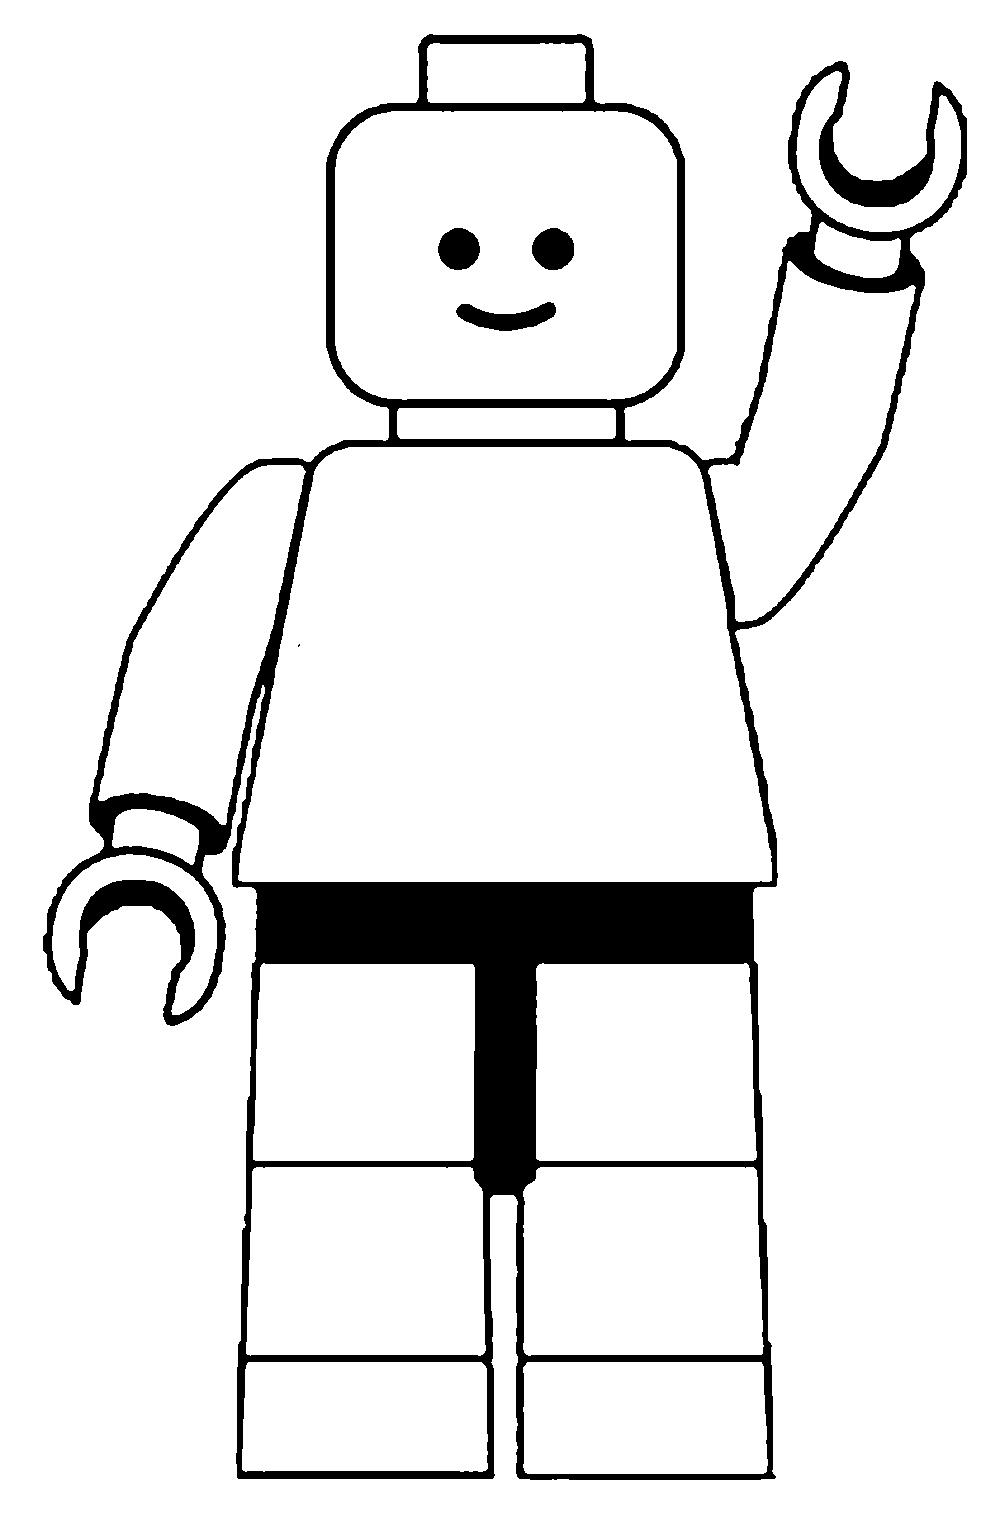 Lego Man Template Search Results Calendar 2015